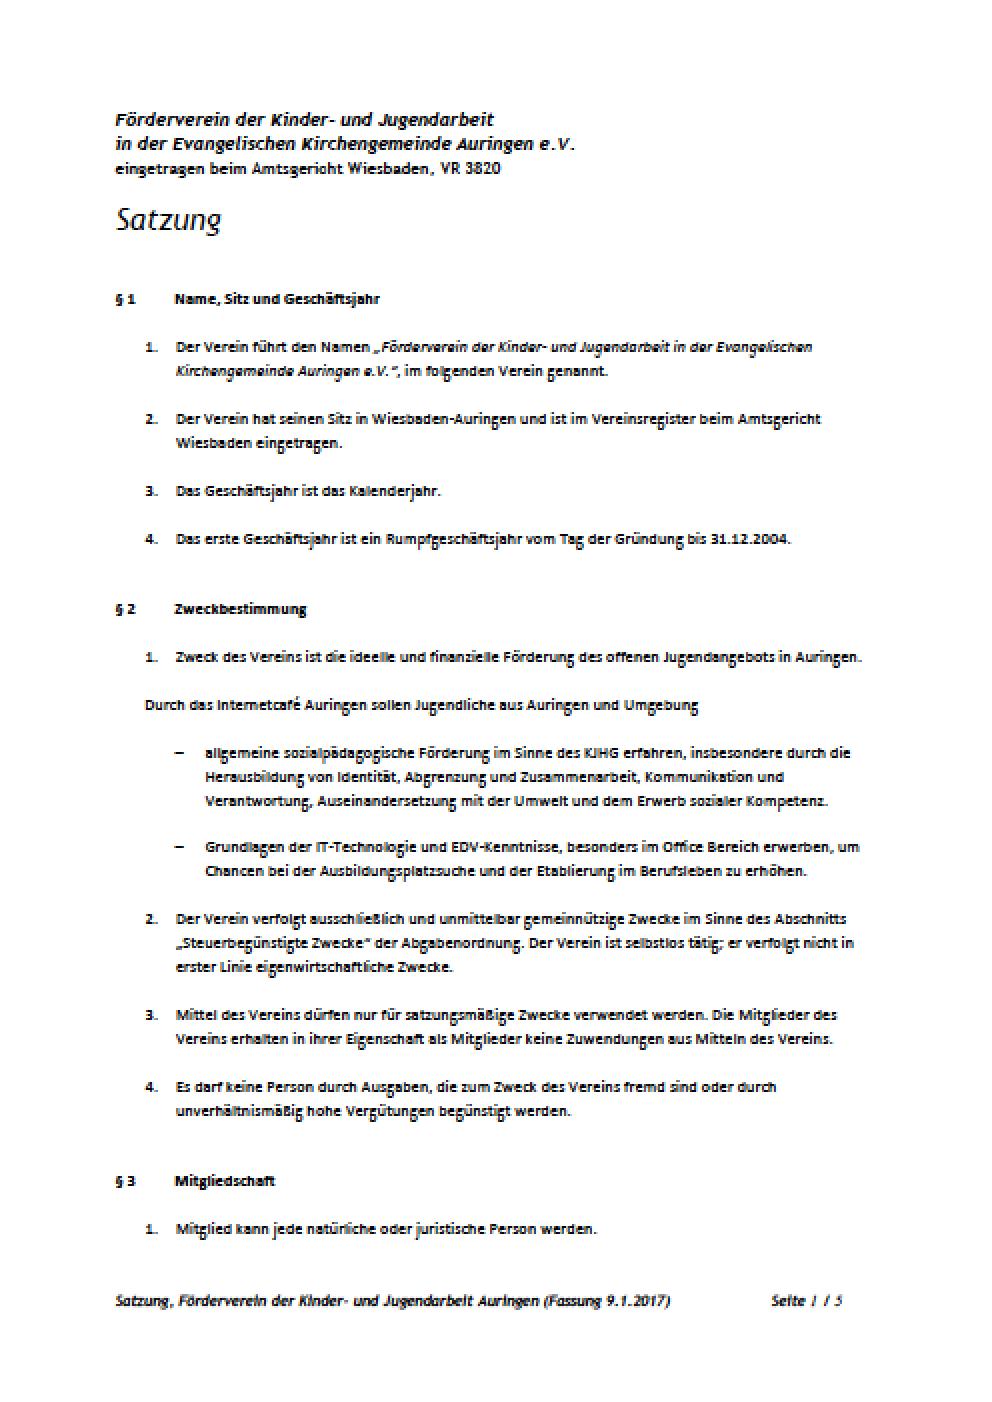 Förderverein Satzung